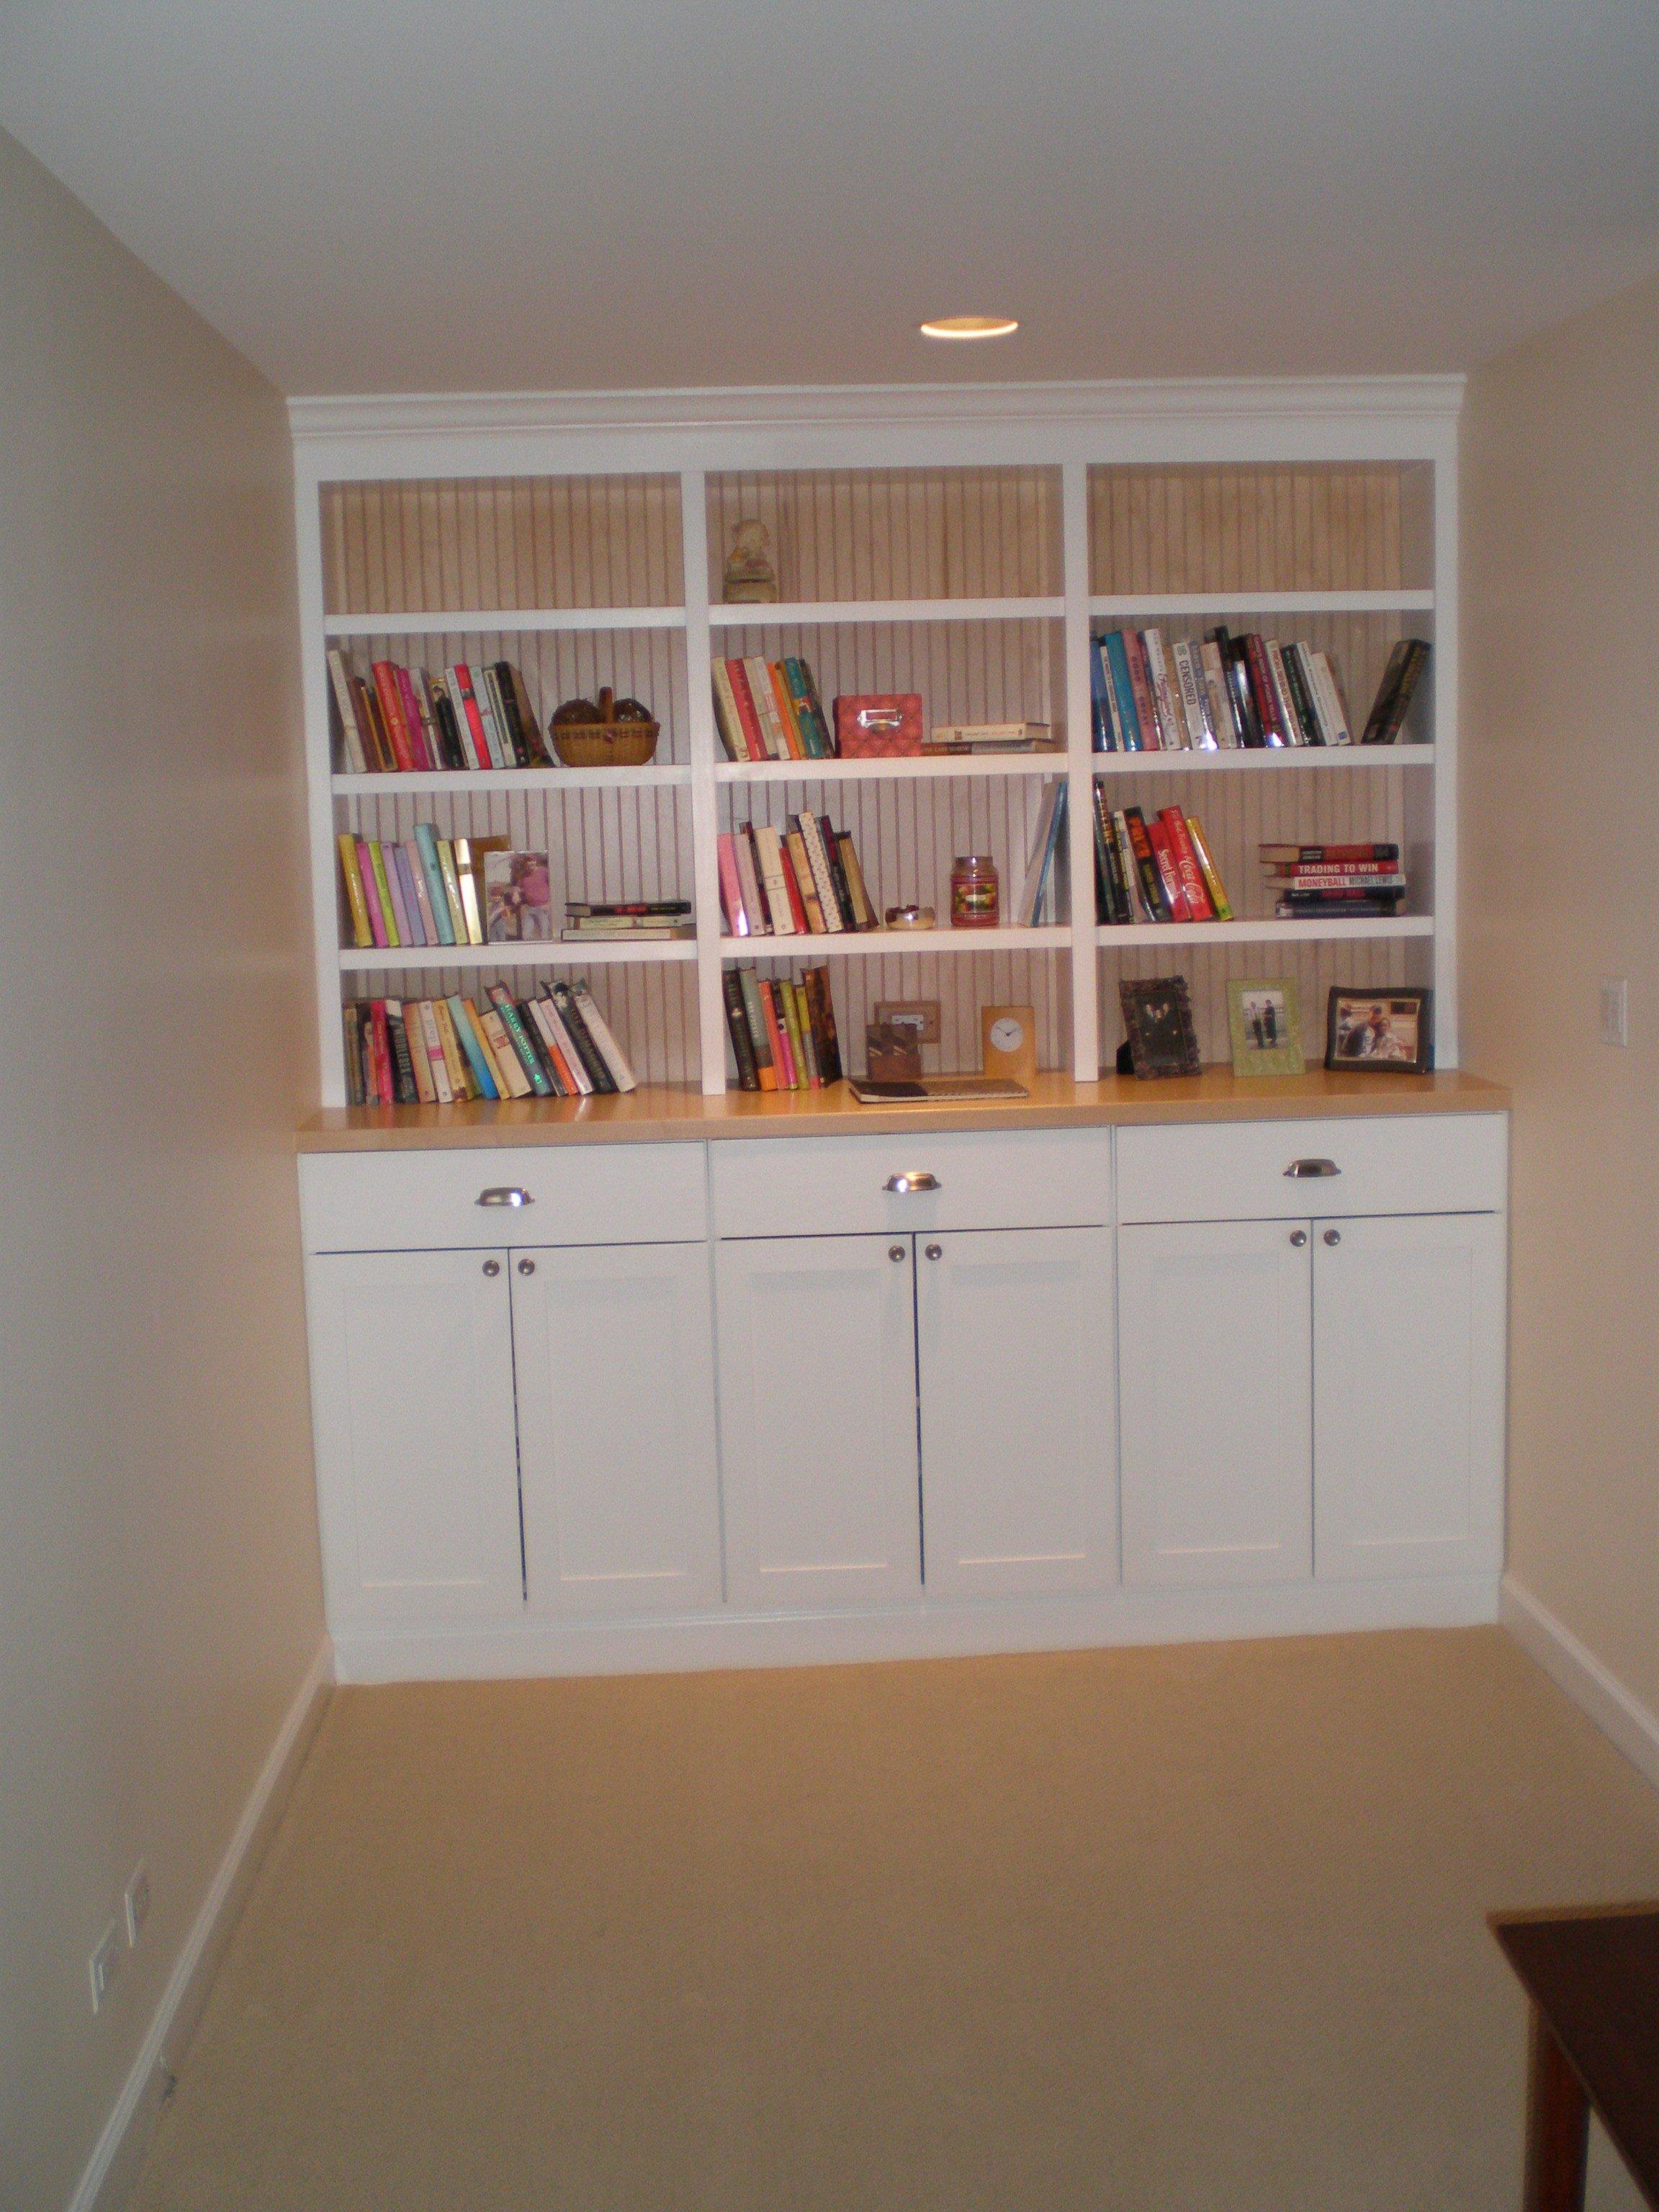 https://0201.nccdn.net/1_2/000/000/119/c9b/amy-s-bookcase-2304x3072.jpg